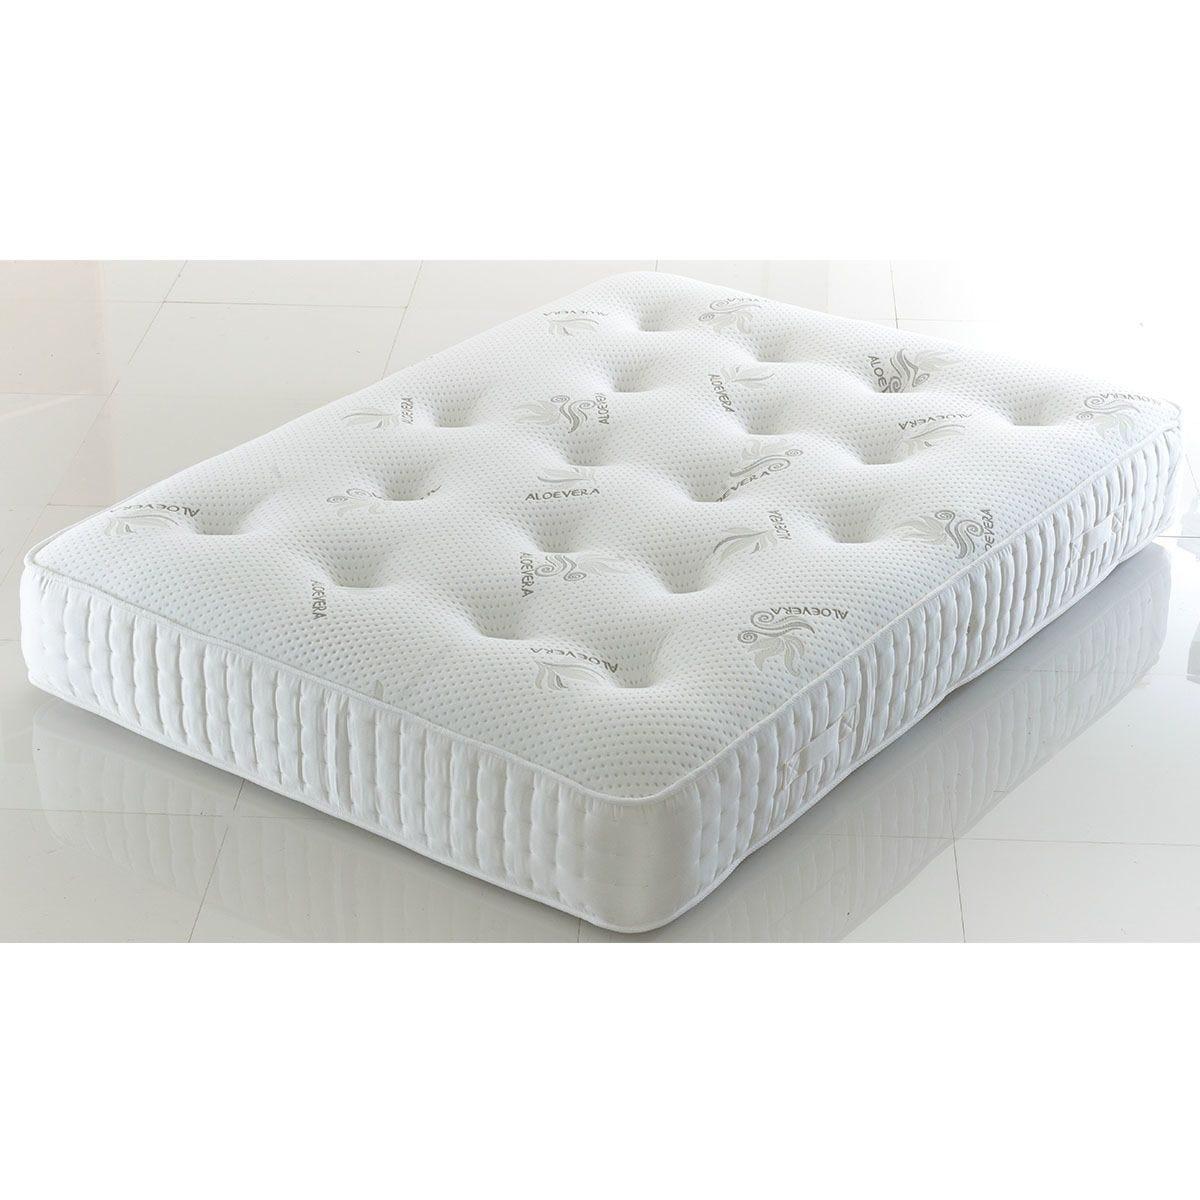 Comfy Deluxe 1500 Pocket Kashmira Memory Mattress - White